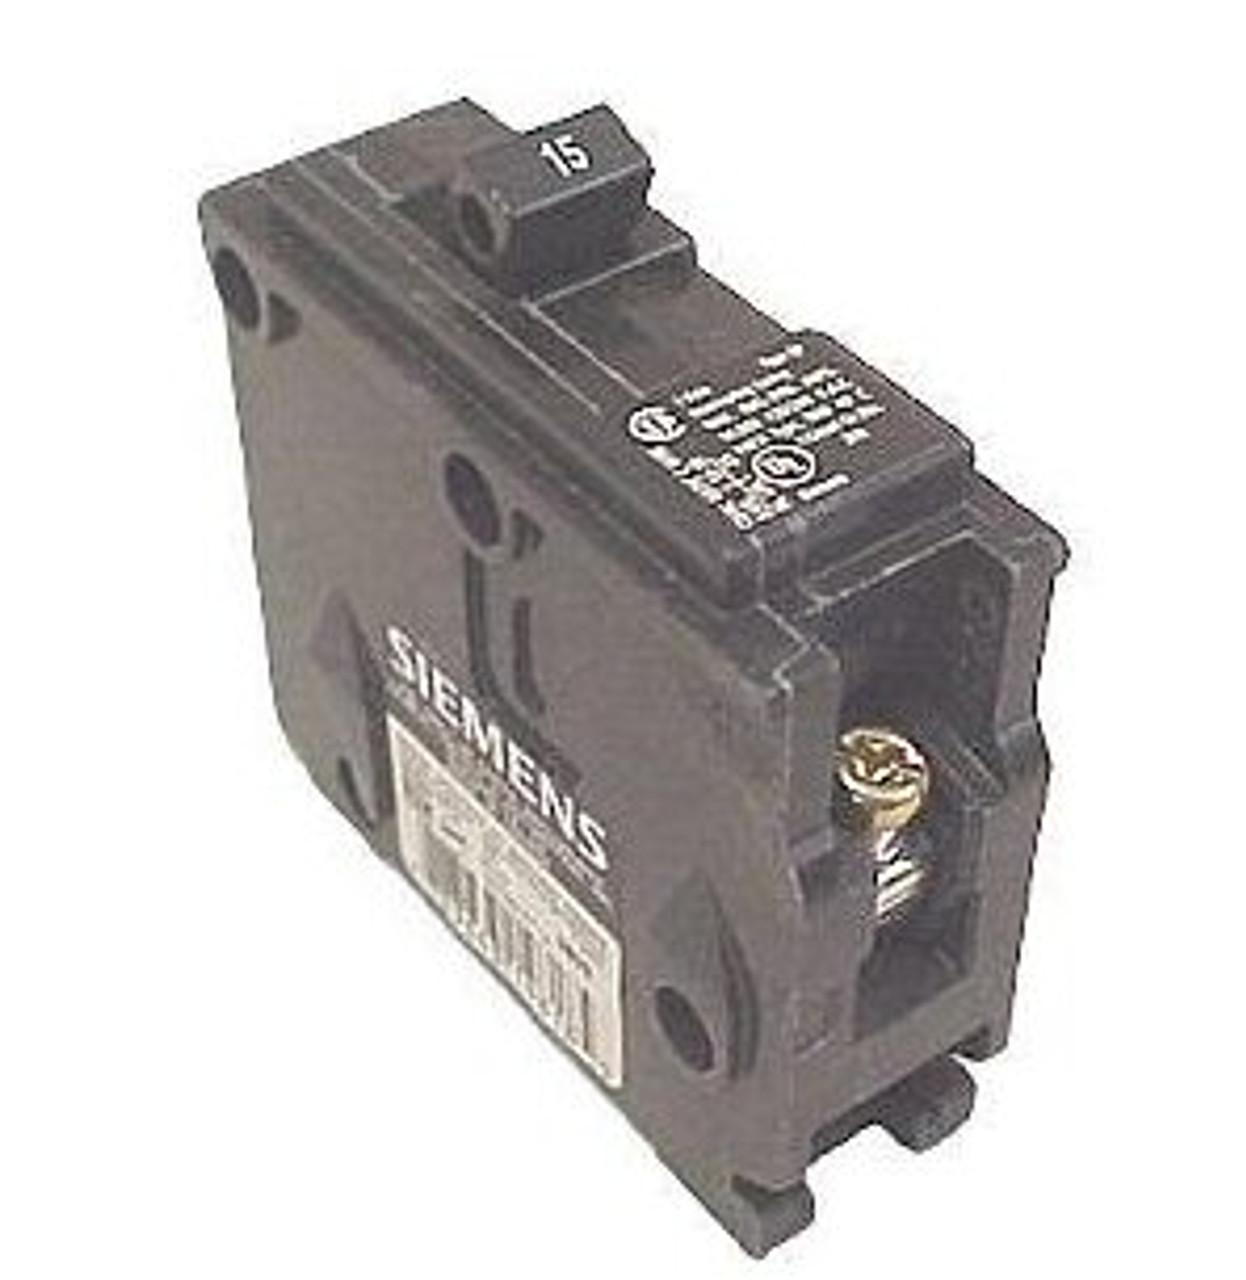 Siemens QF120A 1 Pole, 20 Amps, 120V, Type Q GFI Circuit Breaker - New